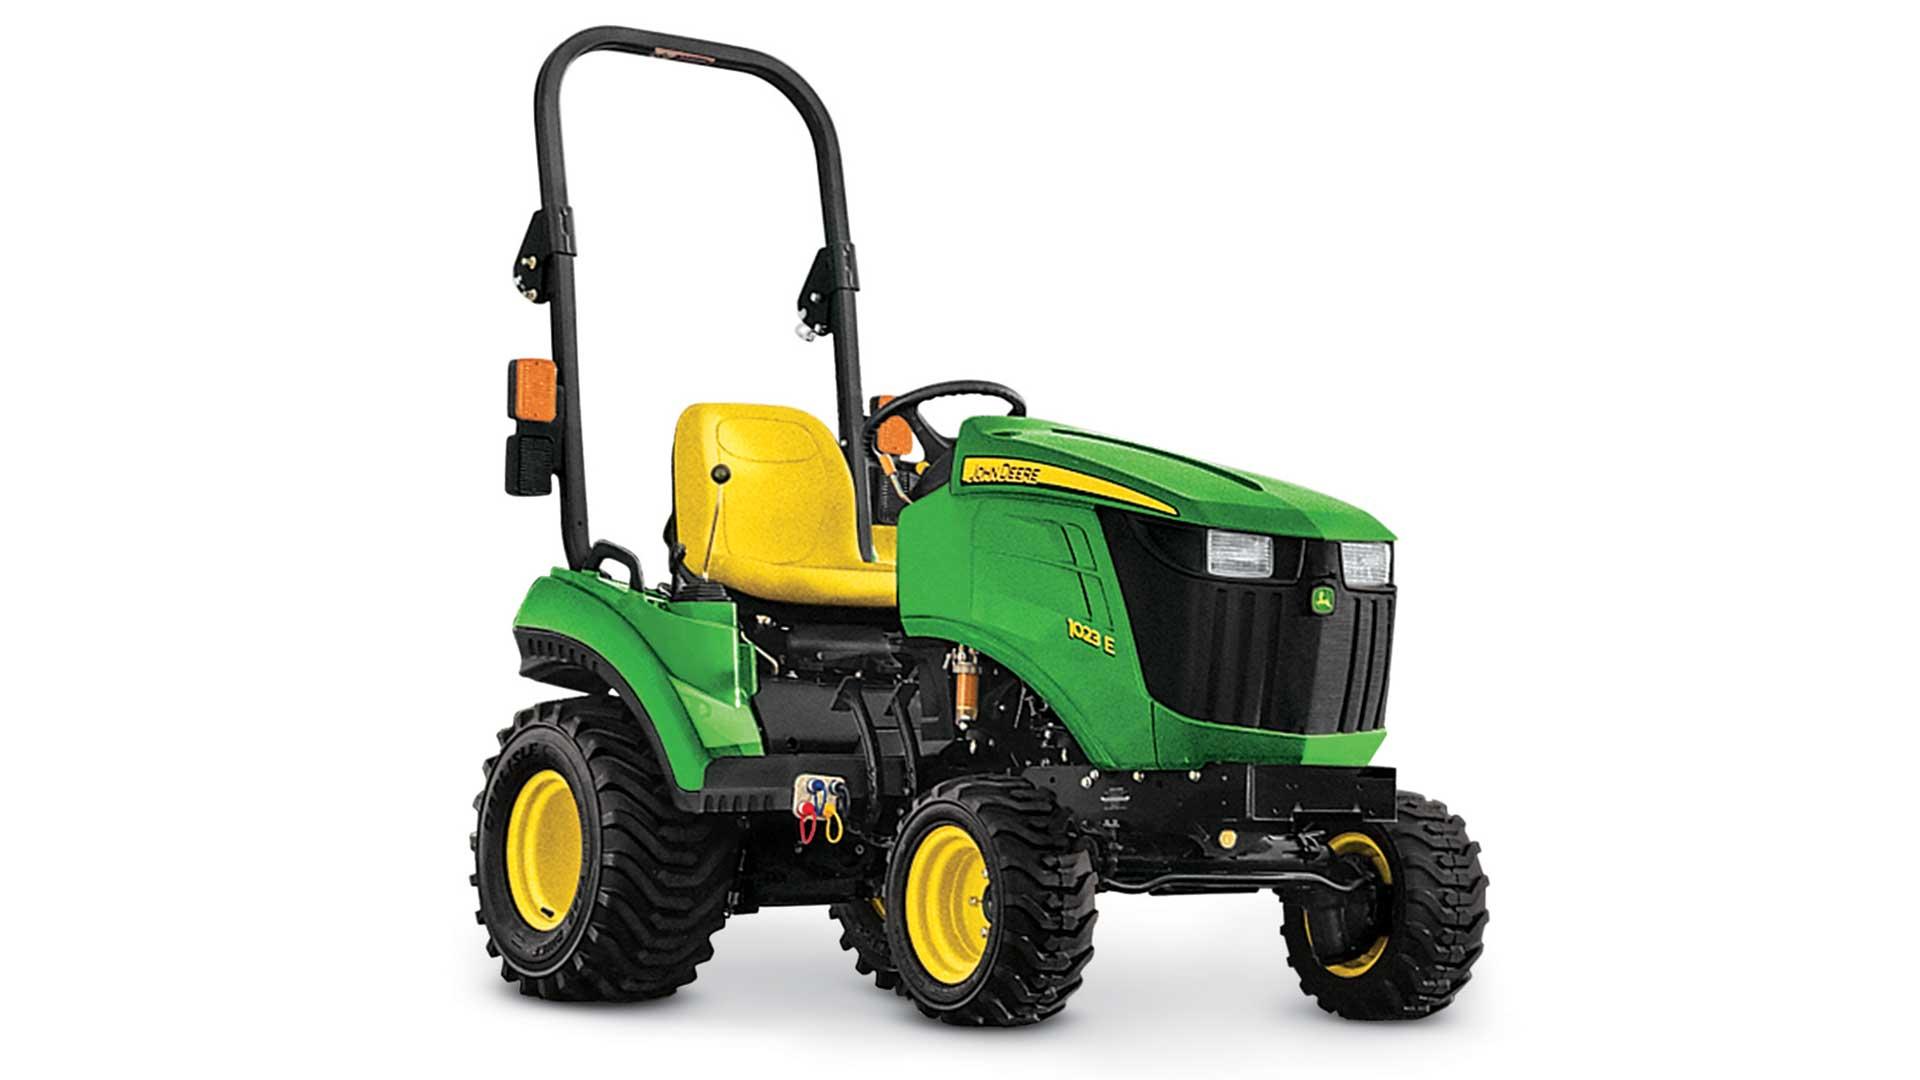 Utility Tractors and 459E Baler | E-Series | John Deere CA